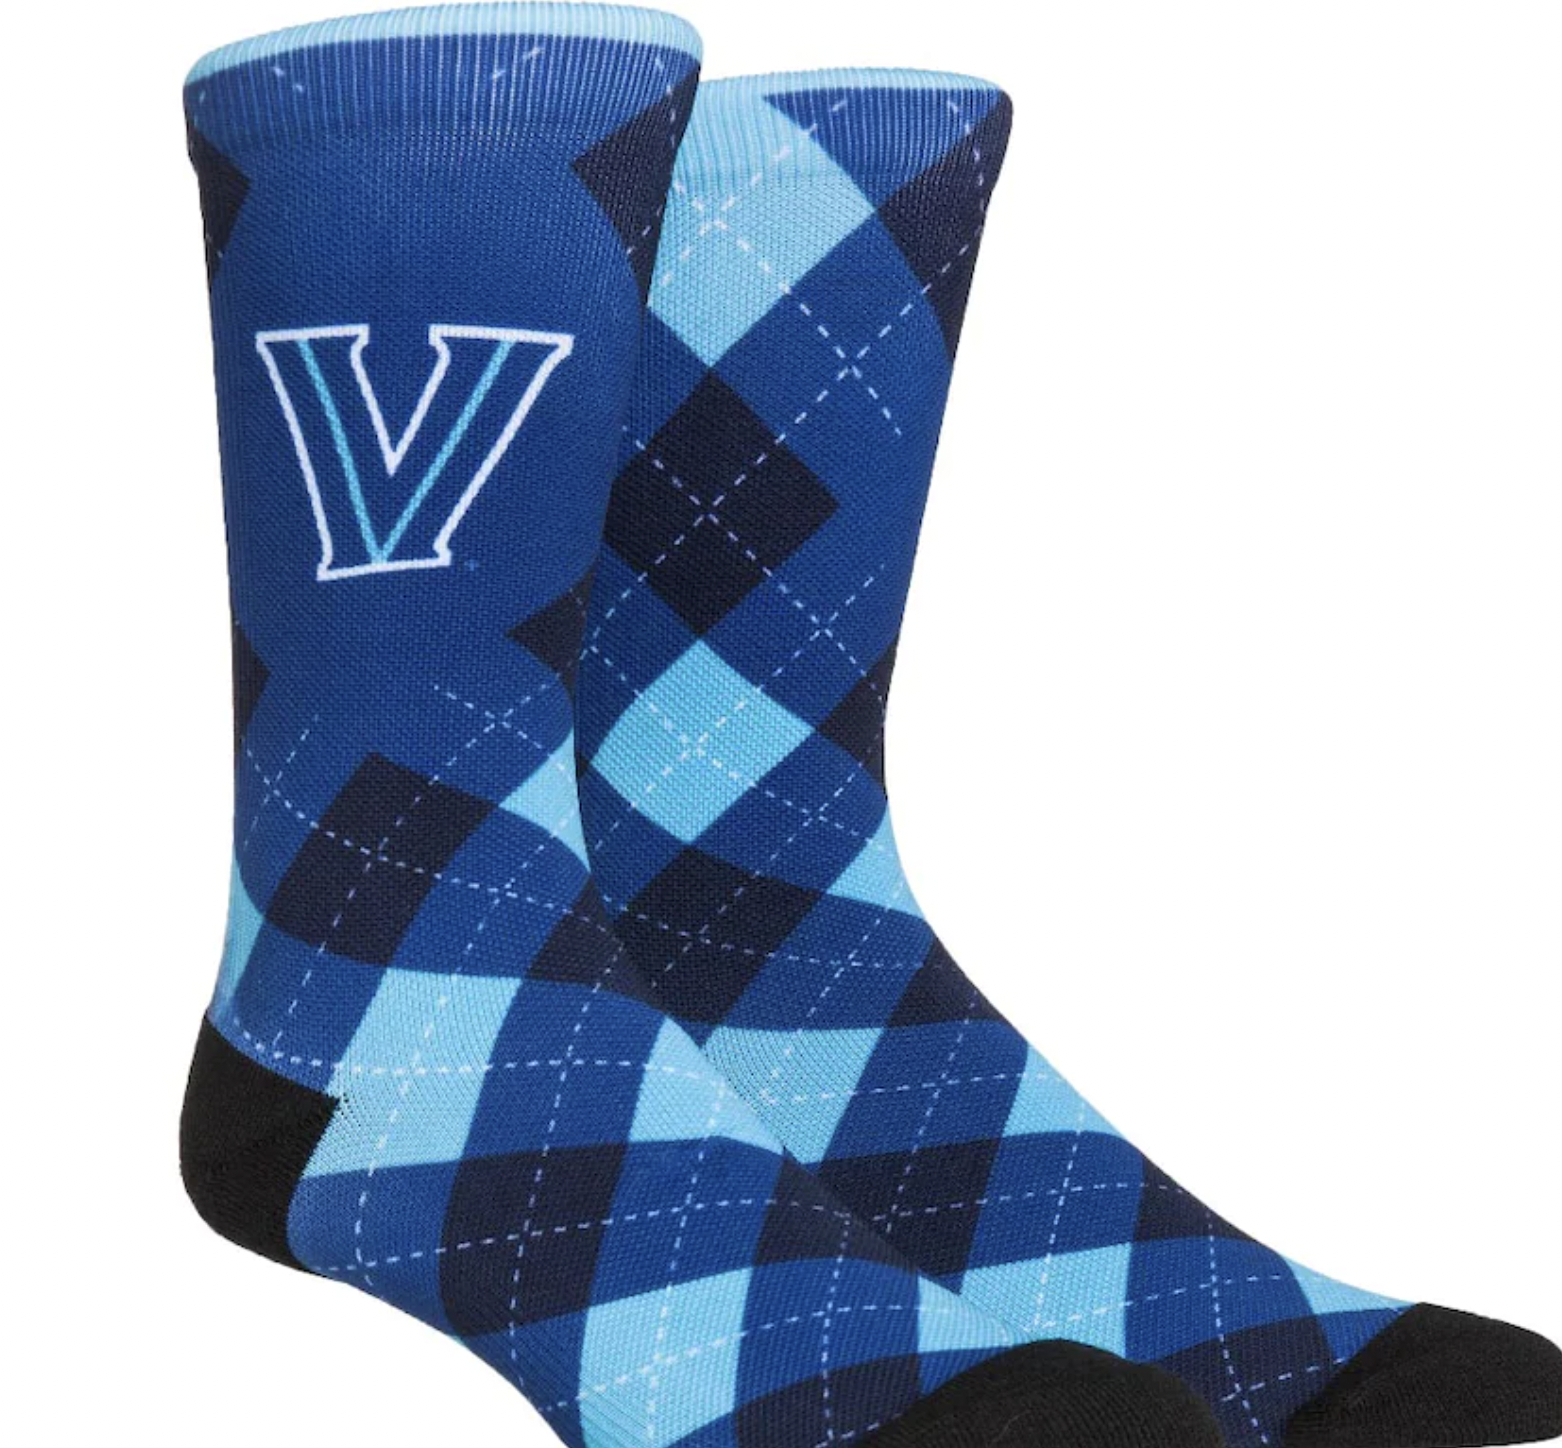 Villanova Wildcats Rock Em Socks HyperOptic Argyle Dress Socks